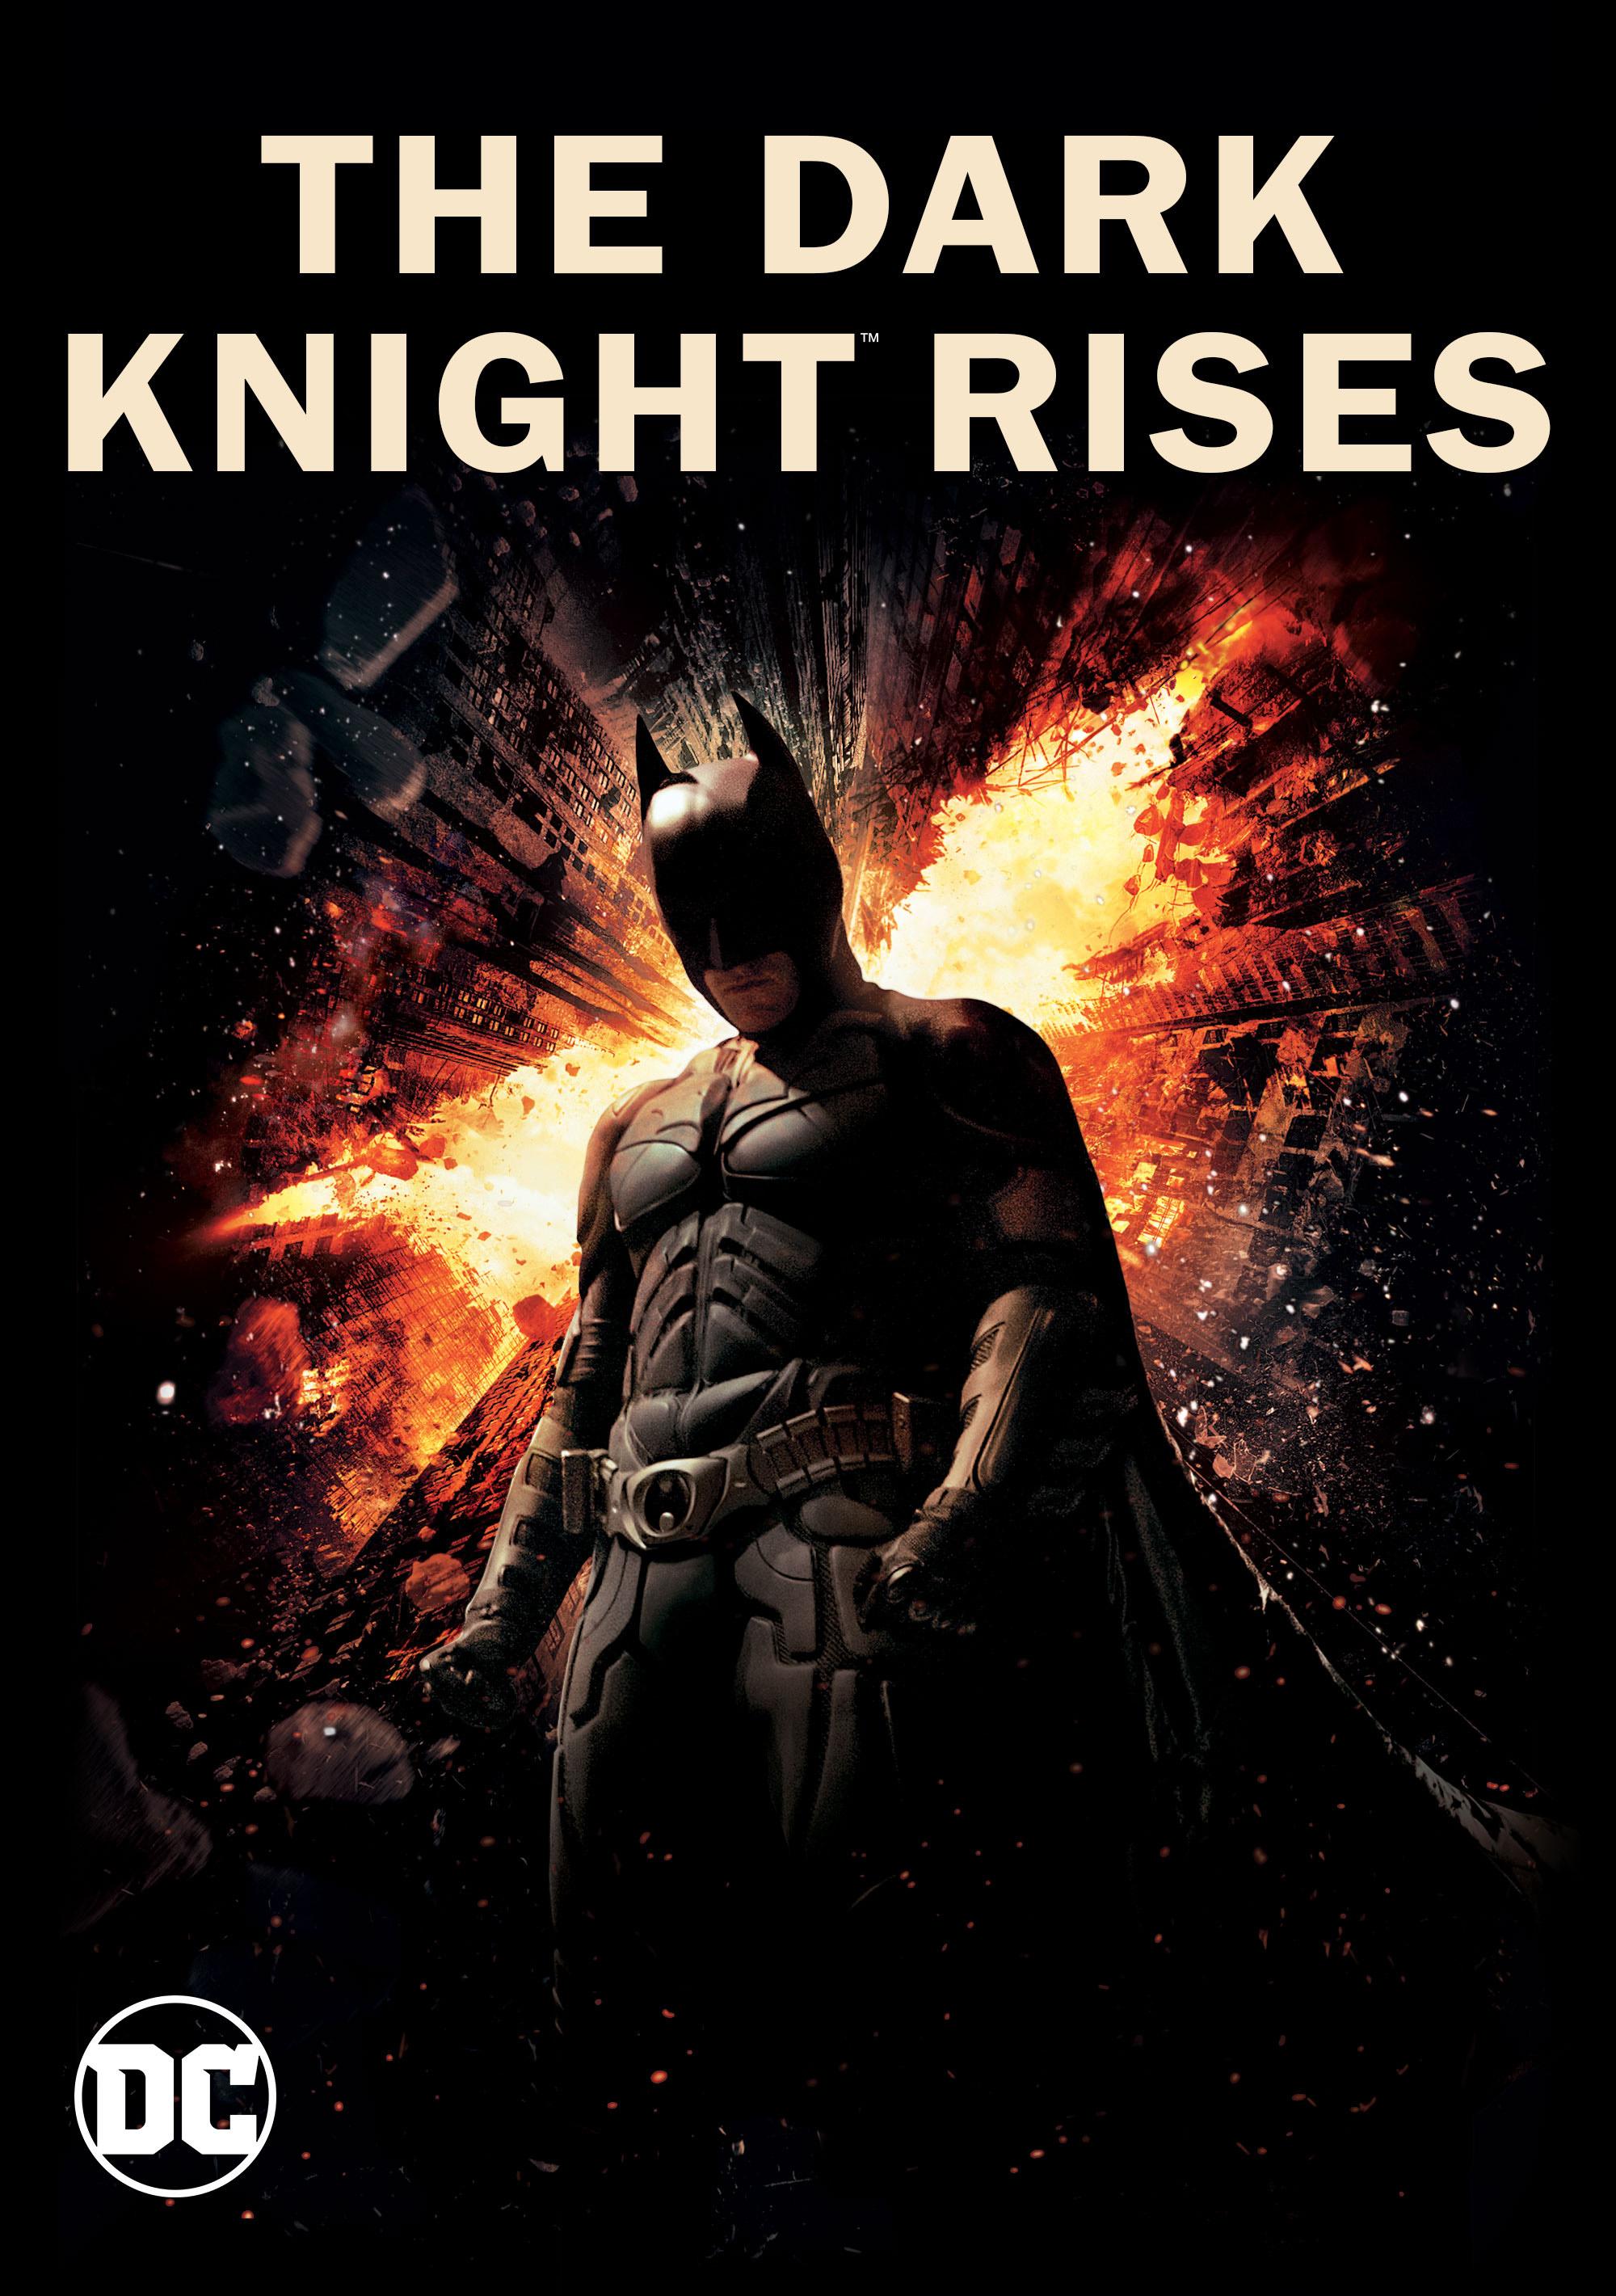 The Dark Knight Rises: Xbox SmartGlass